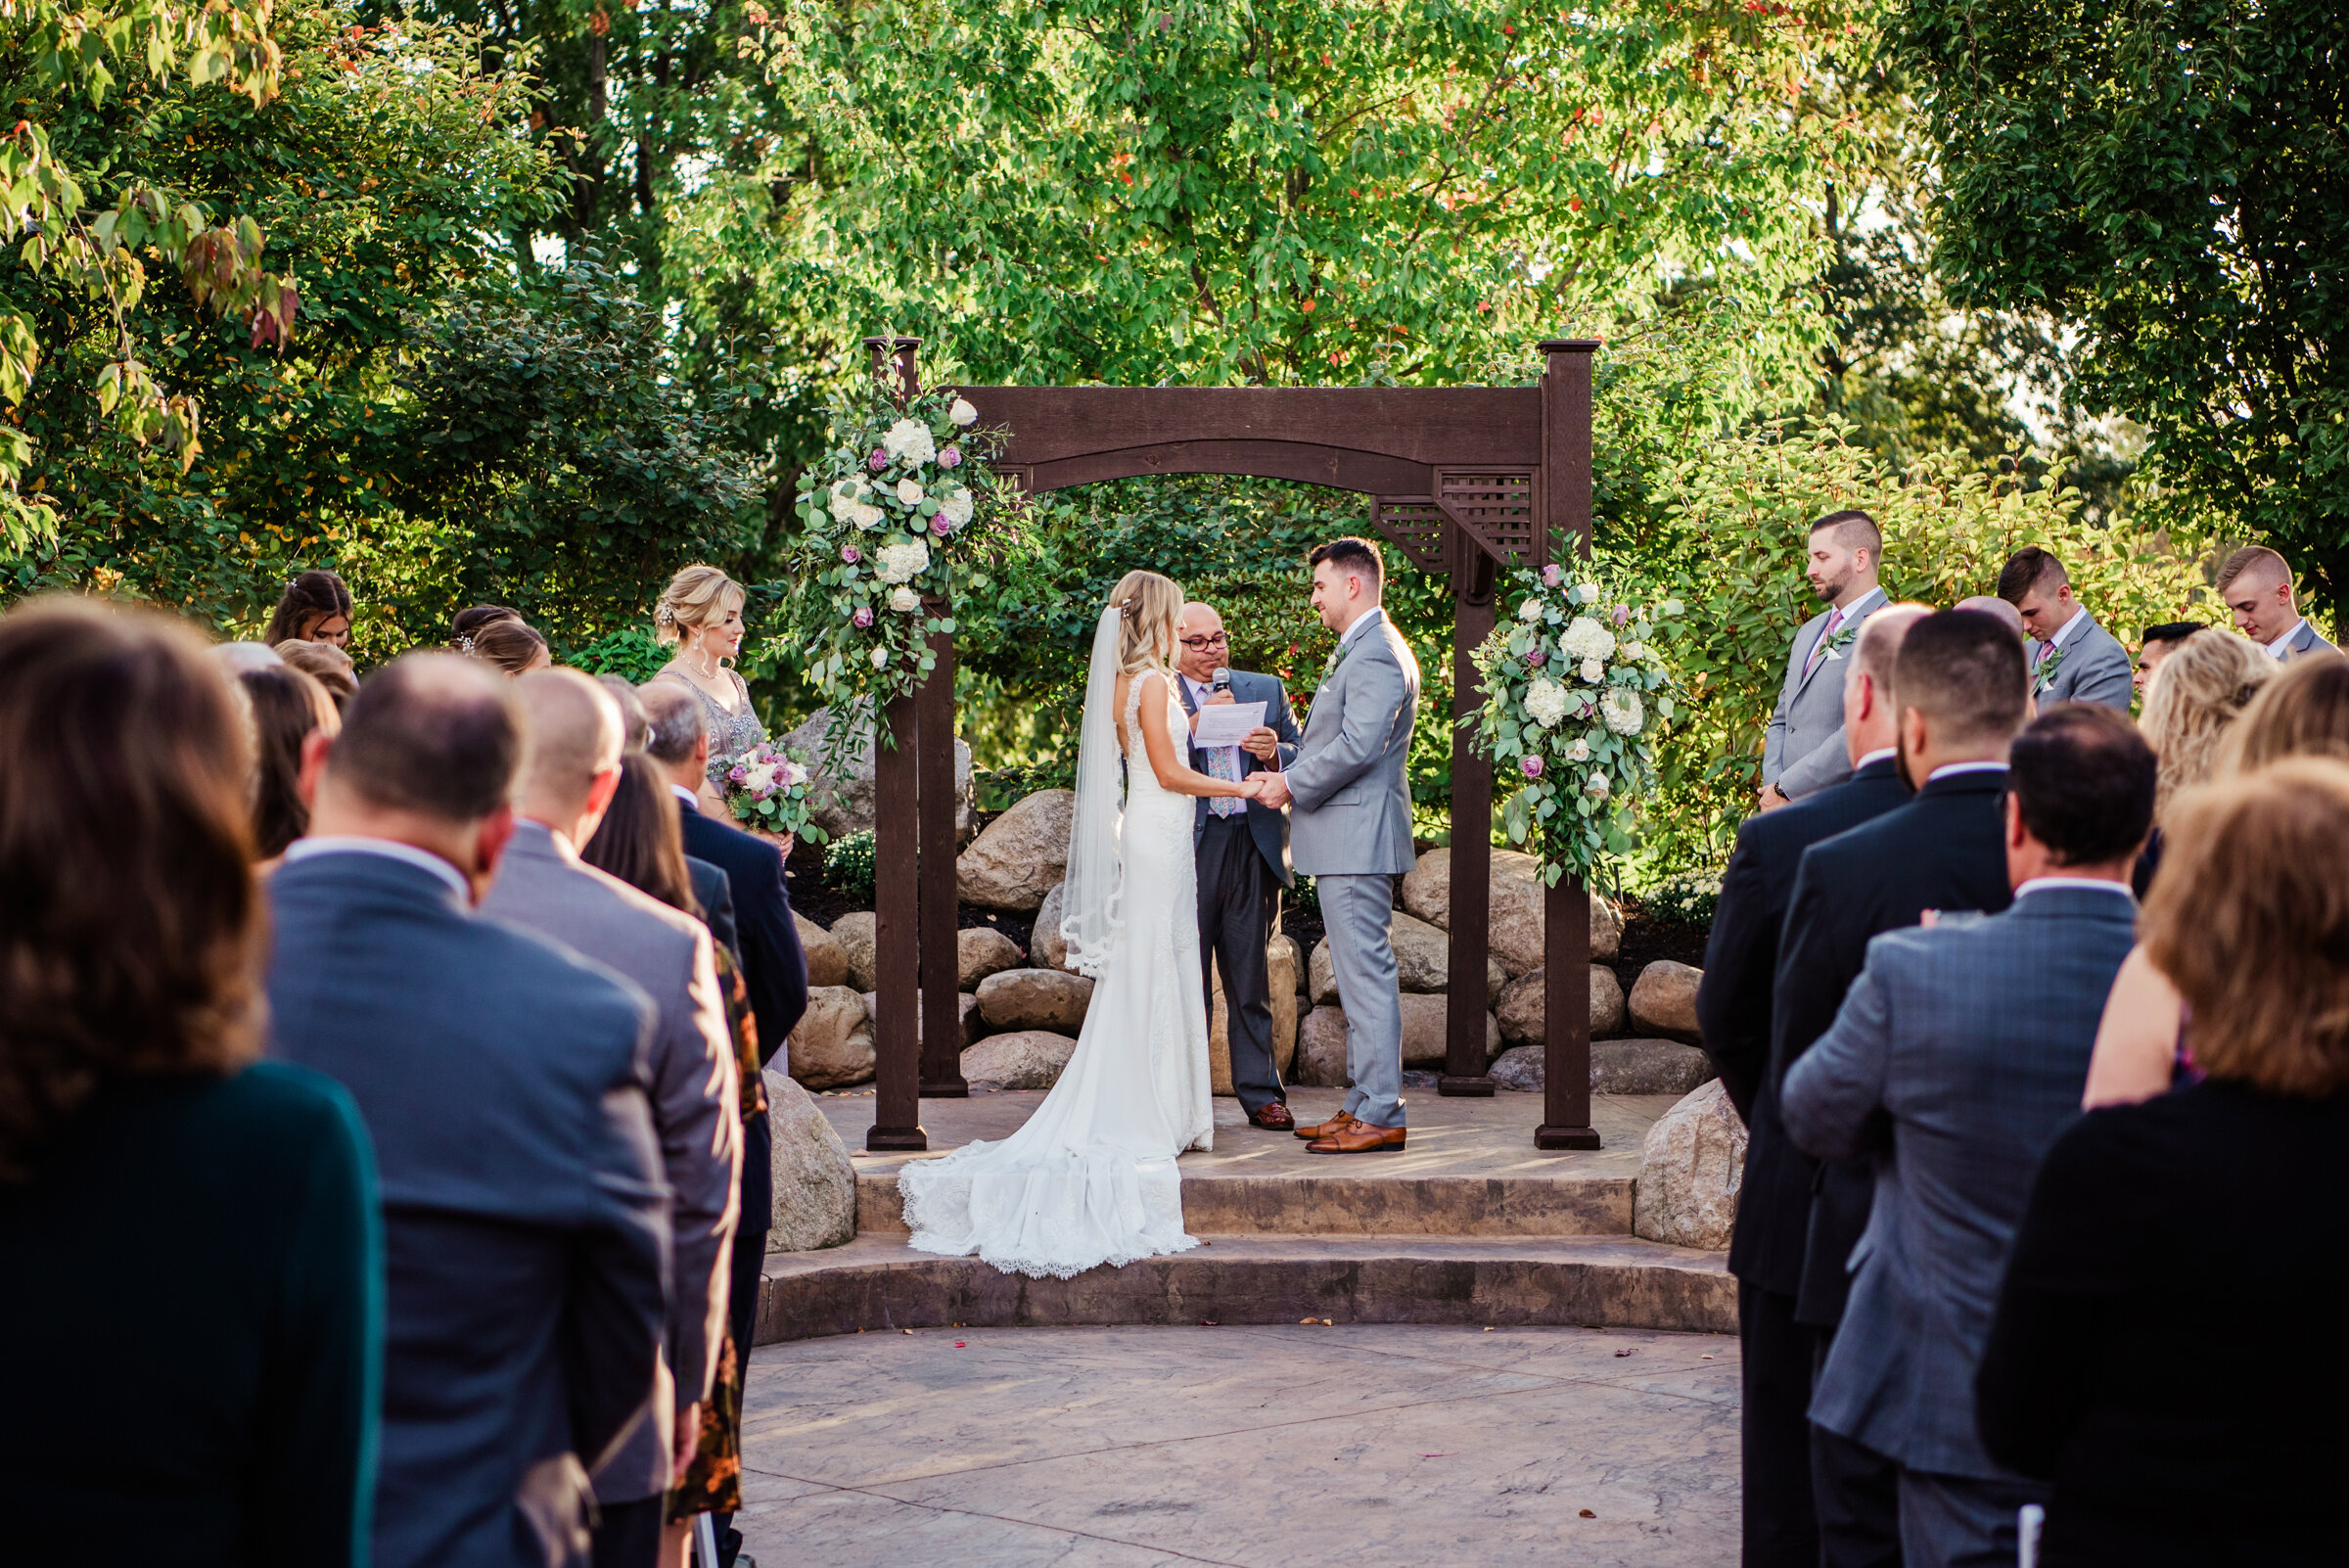 Deerfield_Country_Club_Rochester_Wedding_JILL_STUDIO_Rochester_NY_Photographer_DSC_6778.jpg